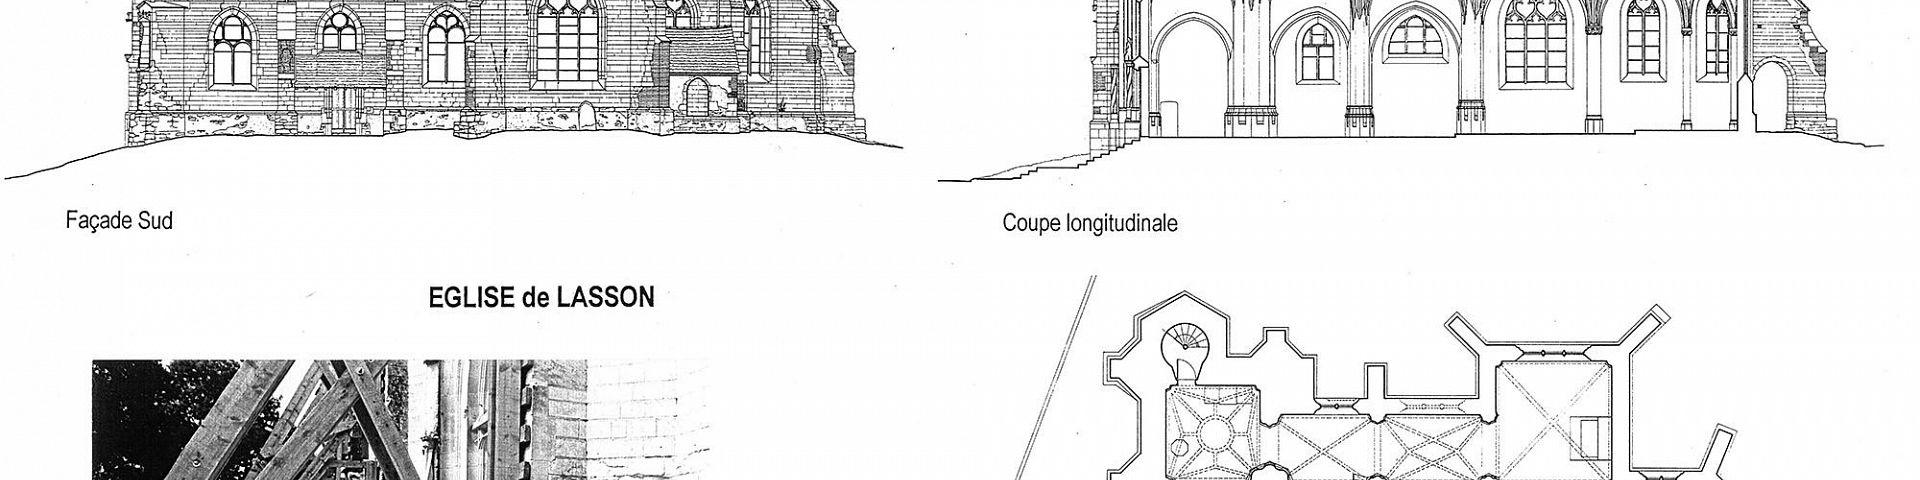 Lasson - Eglise (89)